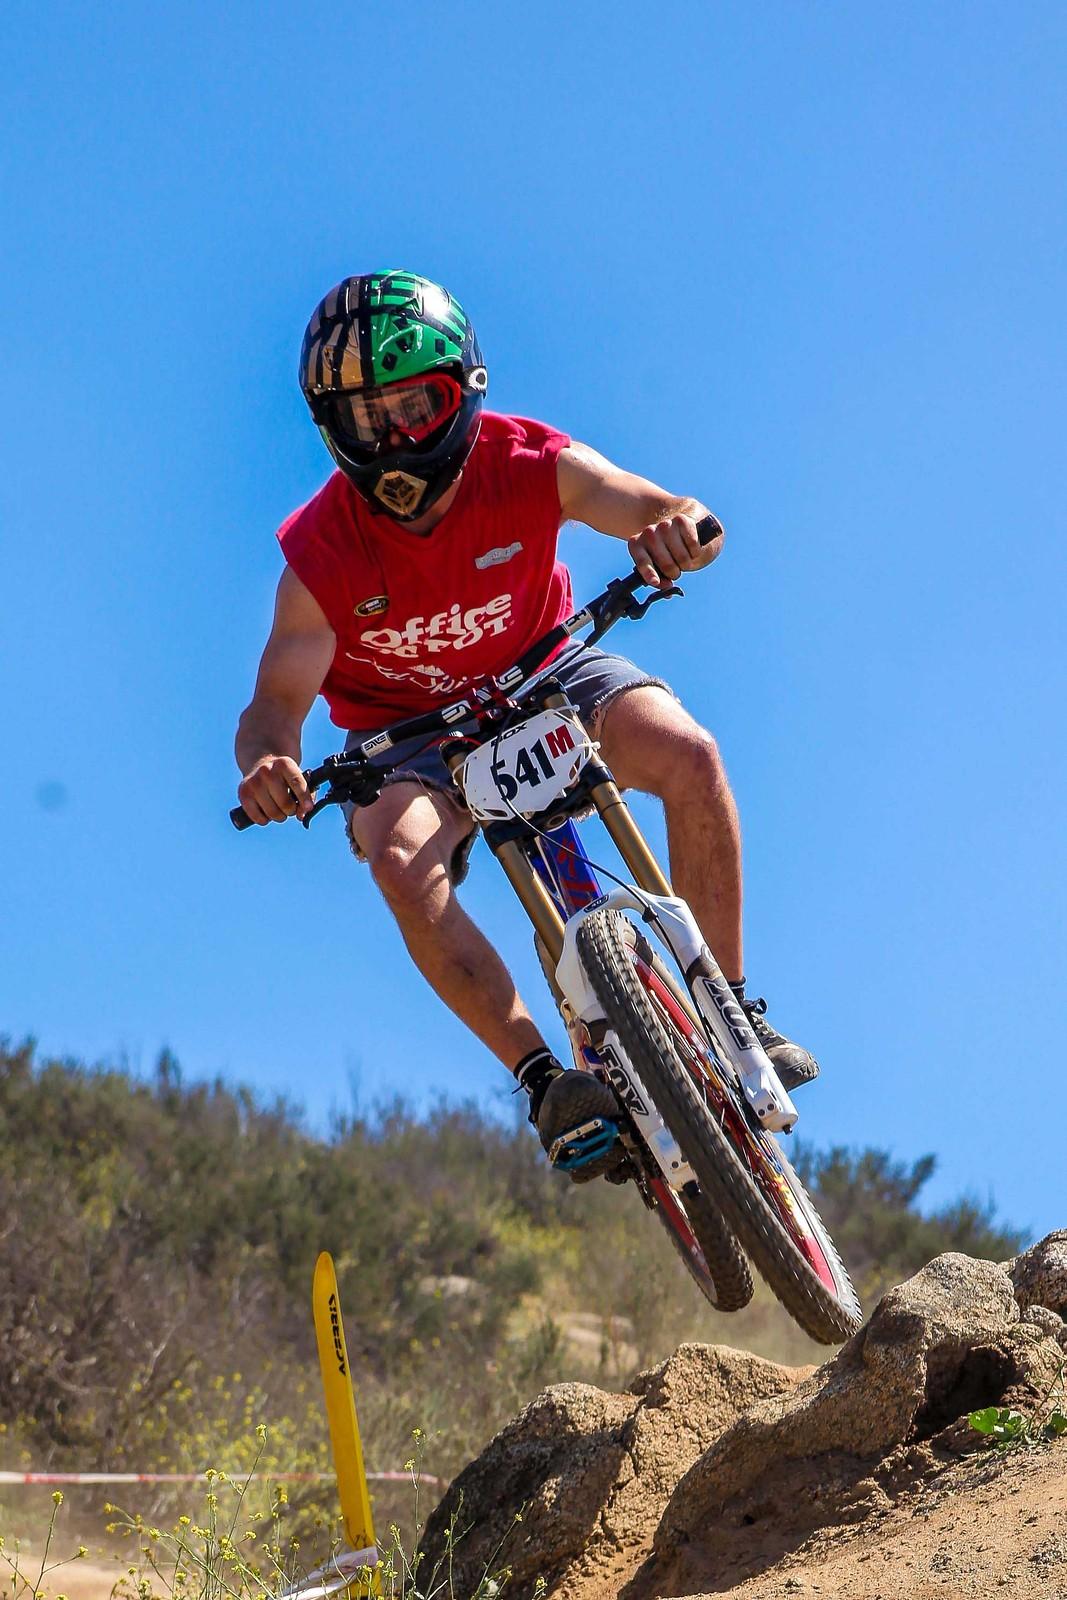 IMG 3310 - GnarHuck - Mountain Biking Pictures - Vital MTB